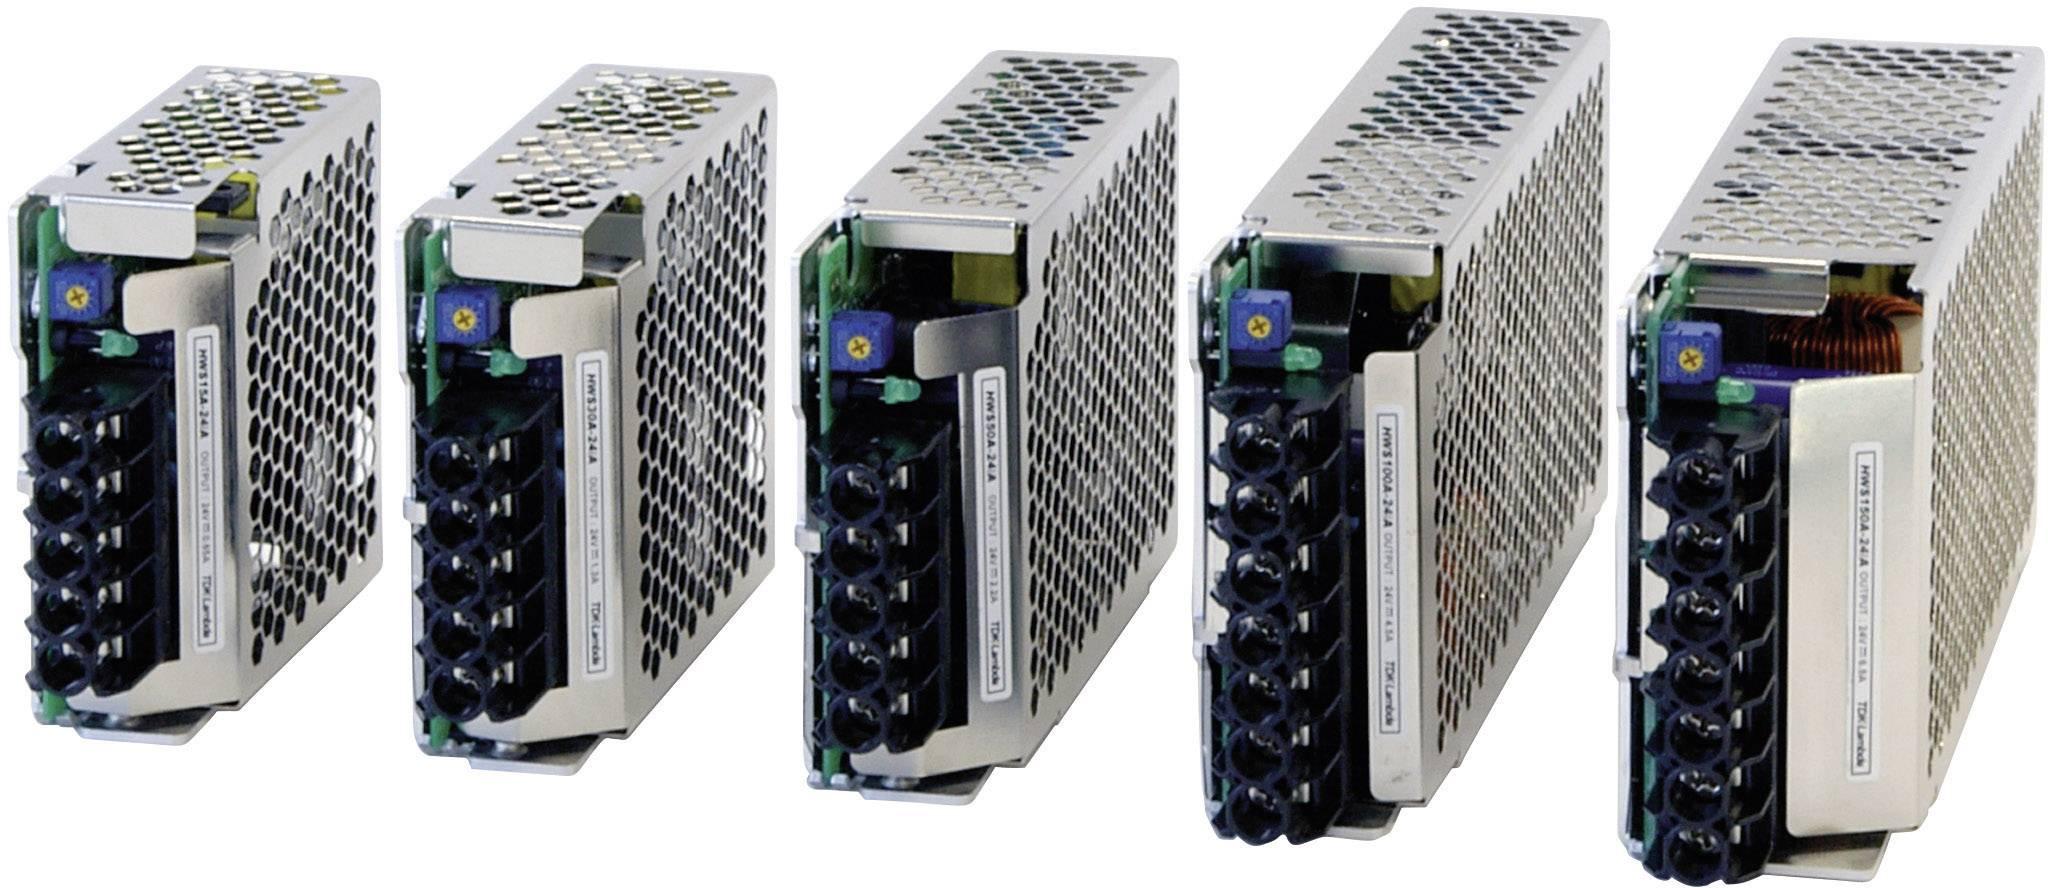 Zabudovateľný napájací zdroj TDK-Lambda HWS-100A-48/A, 48 V, 100,8 W